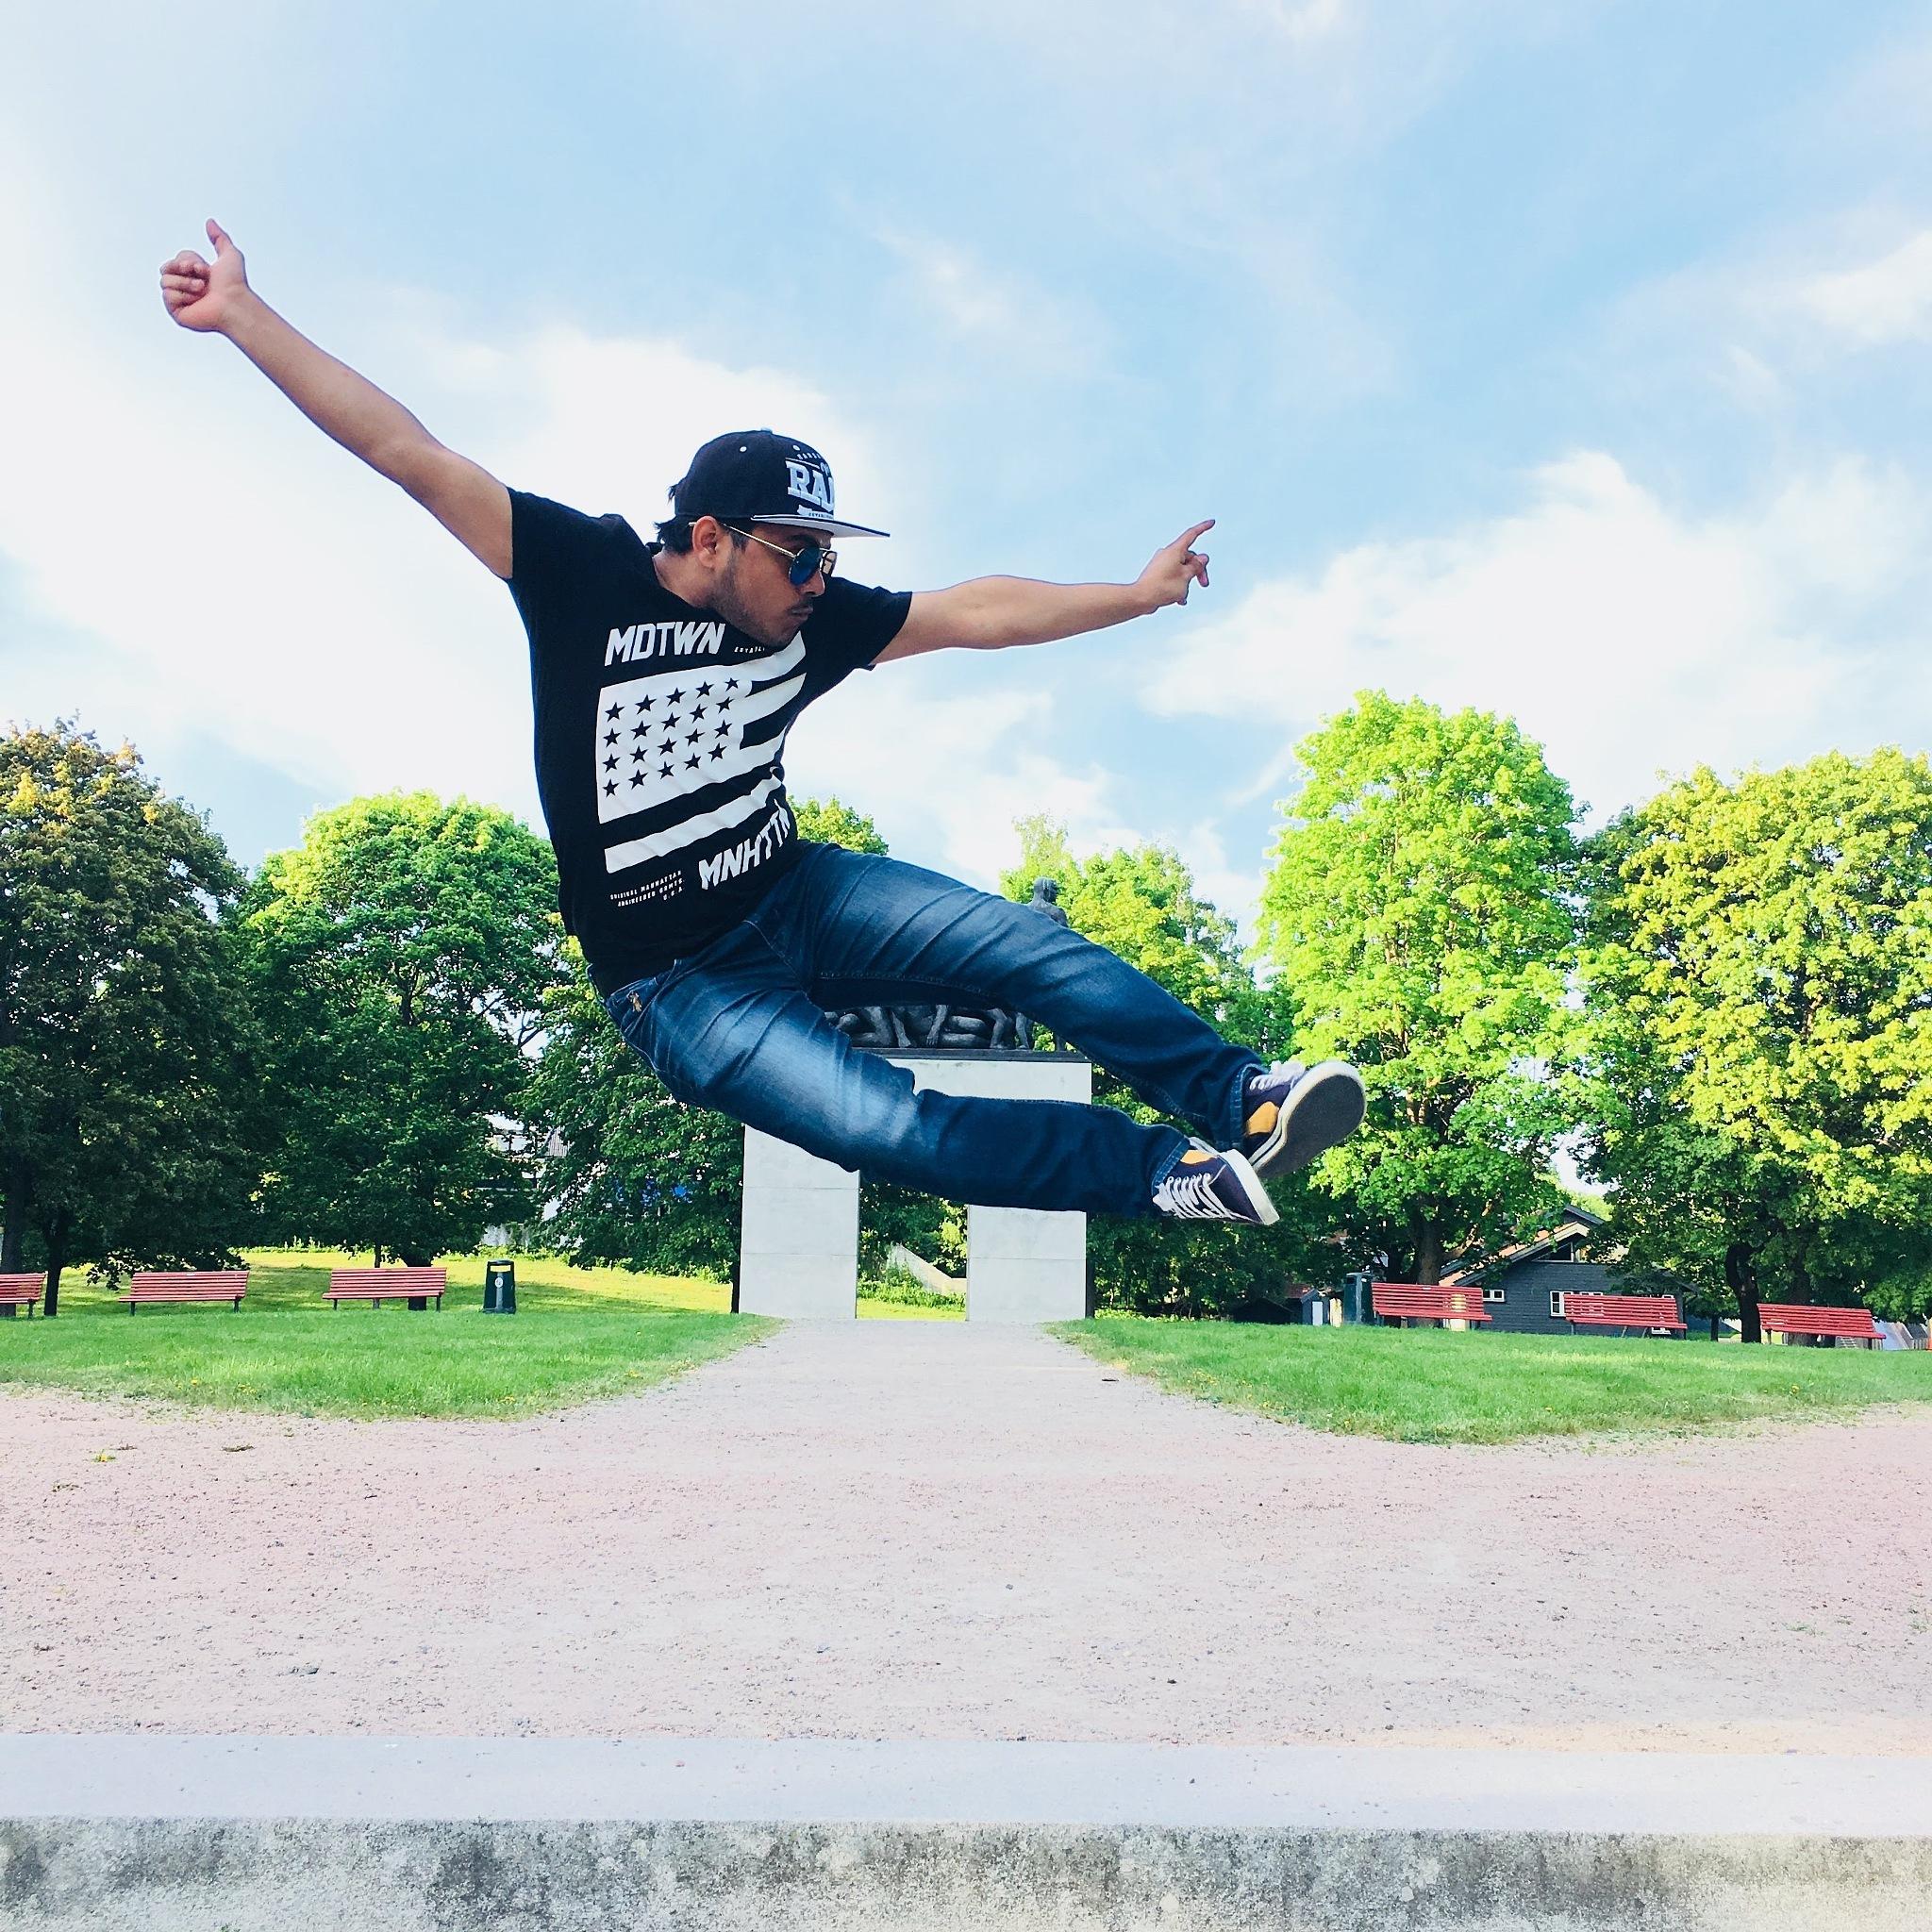 In the air by Deepak Kumar Swain